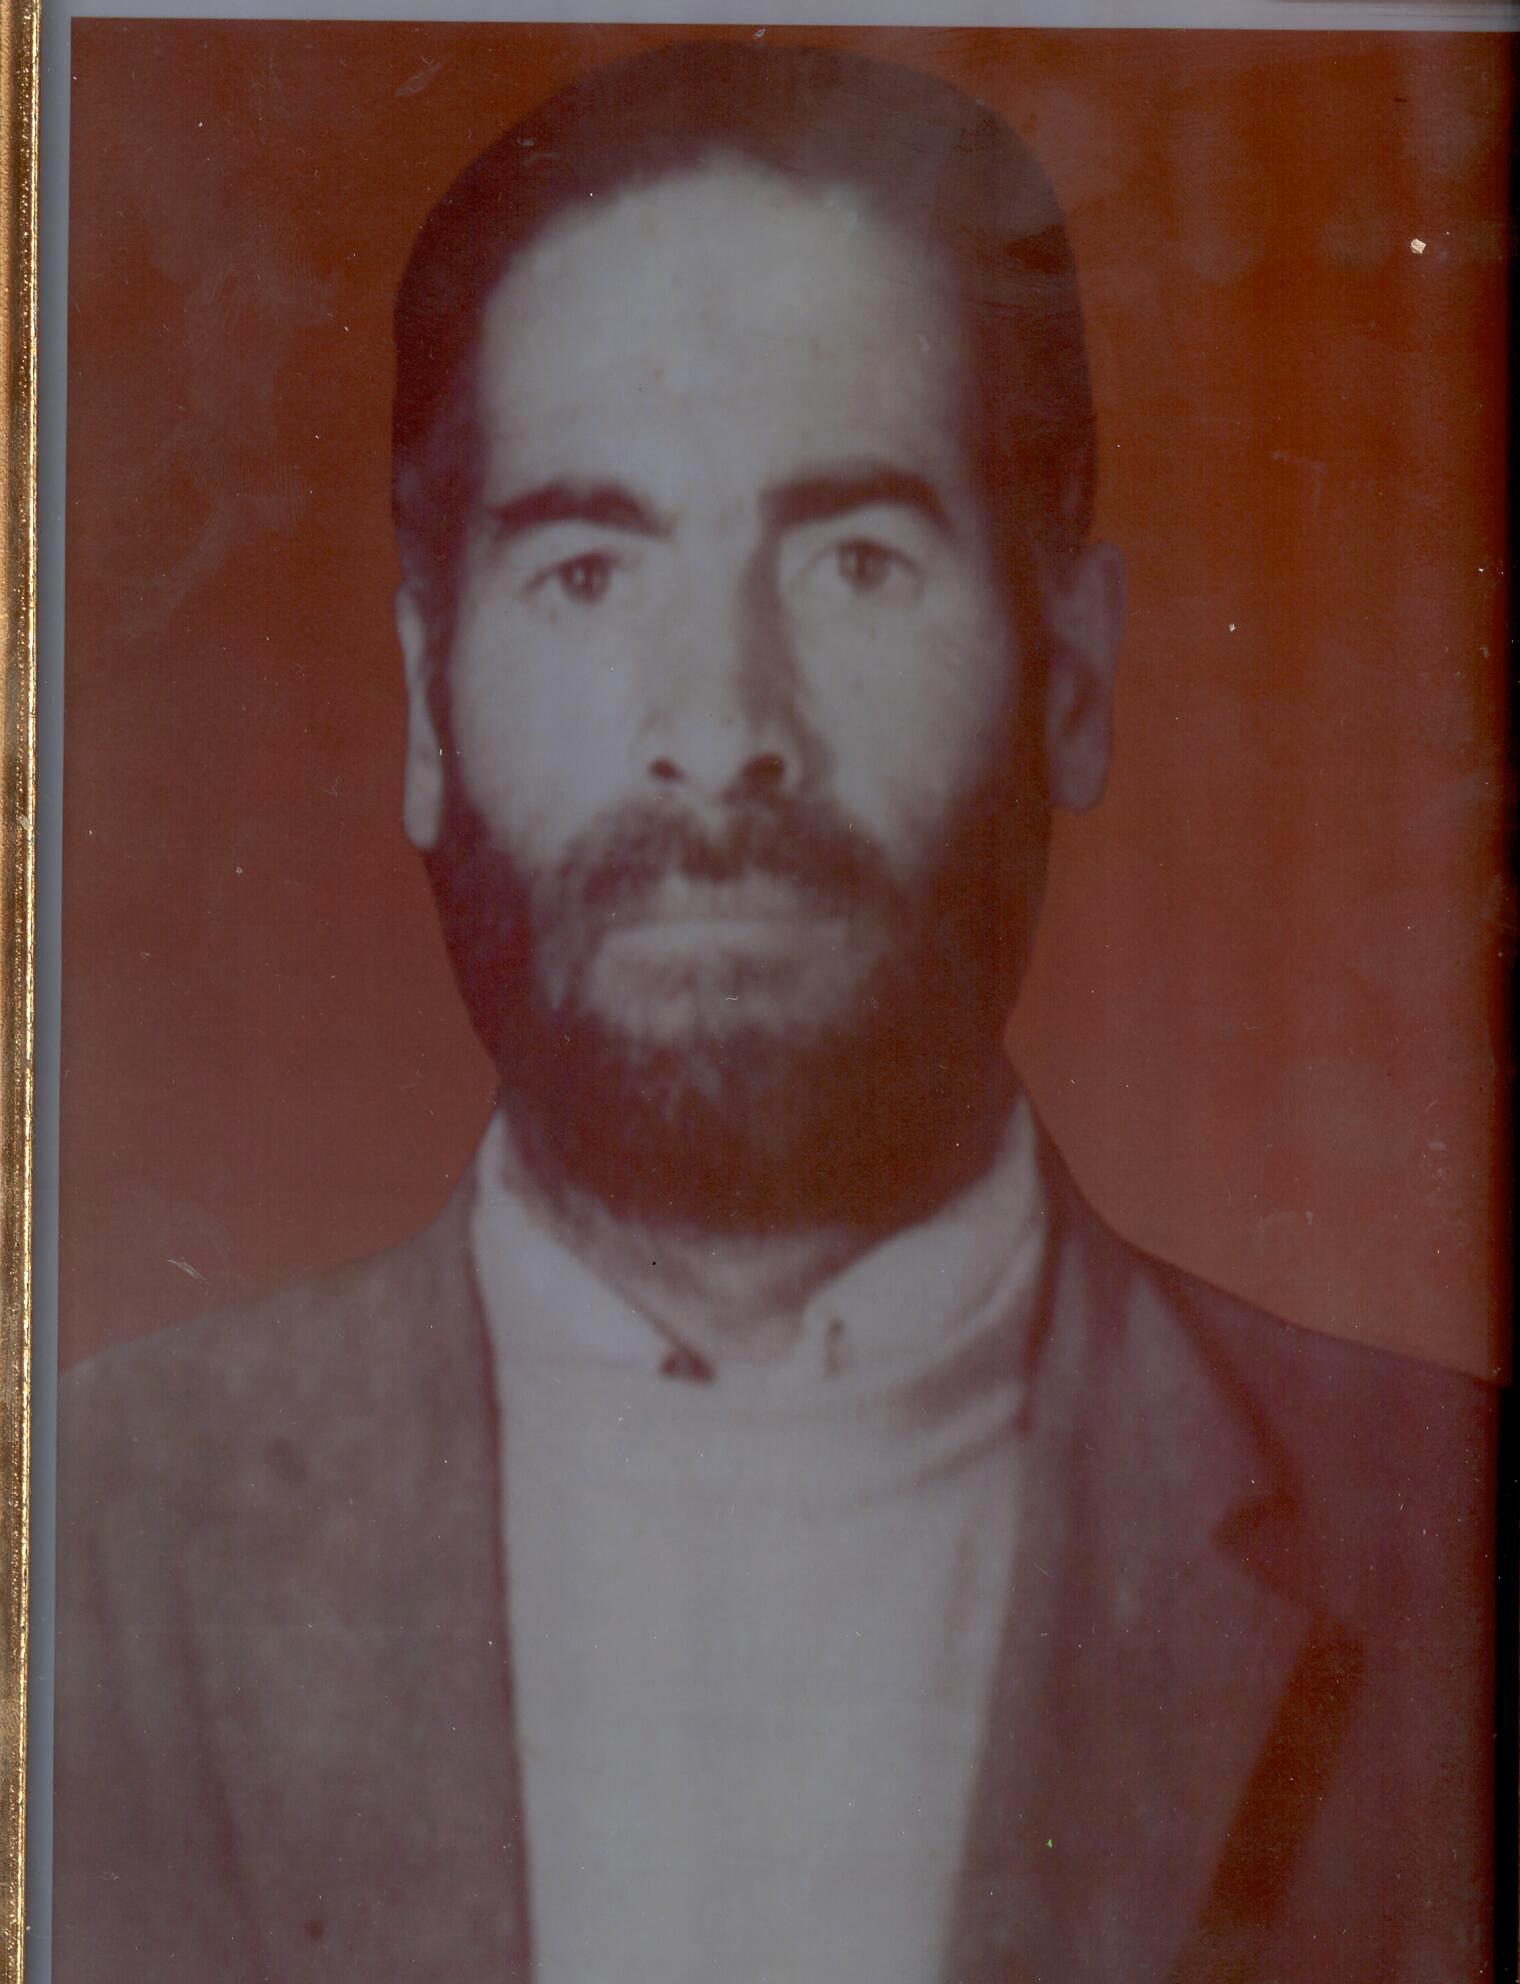 شهیدعلی اصغر محمدی